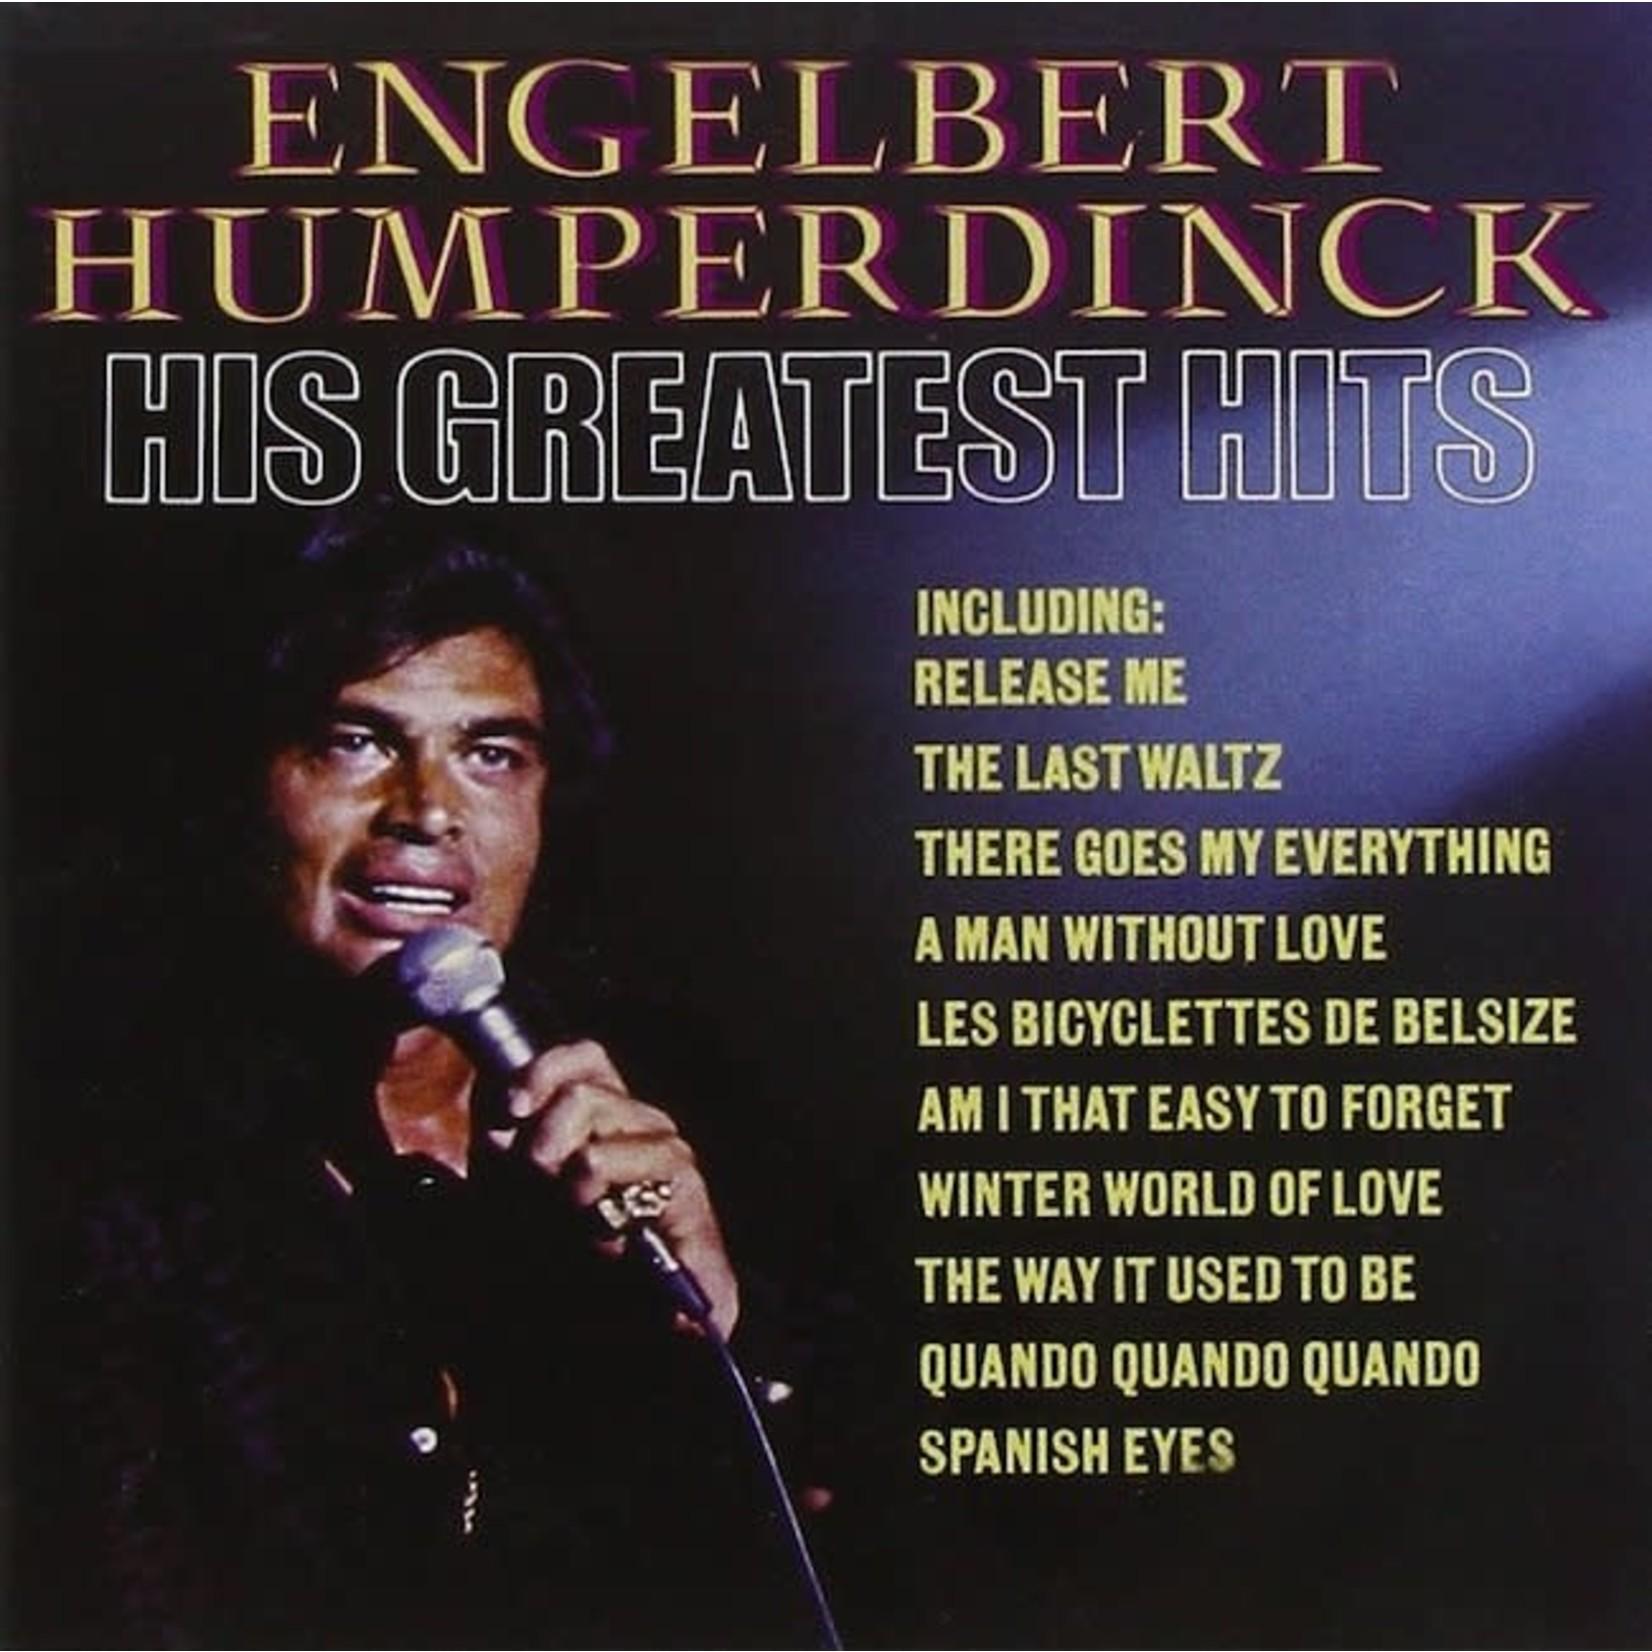 [Vintage] Humperdinck, Engelbert: His Greatest Hits